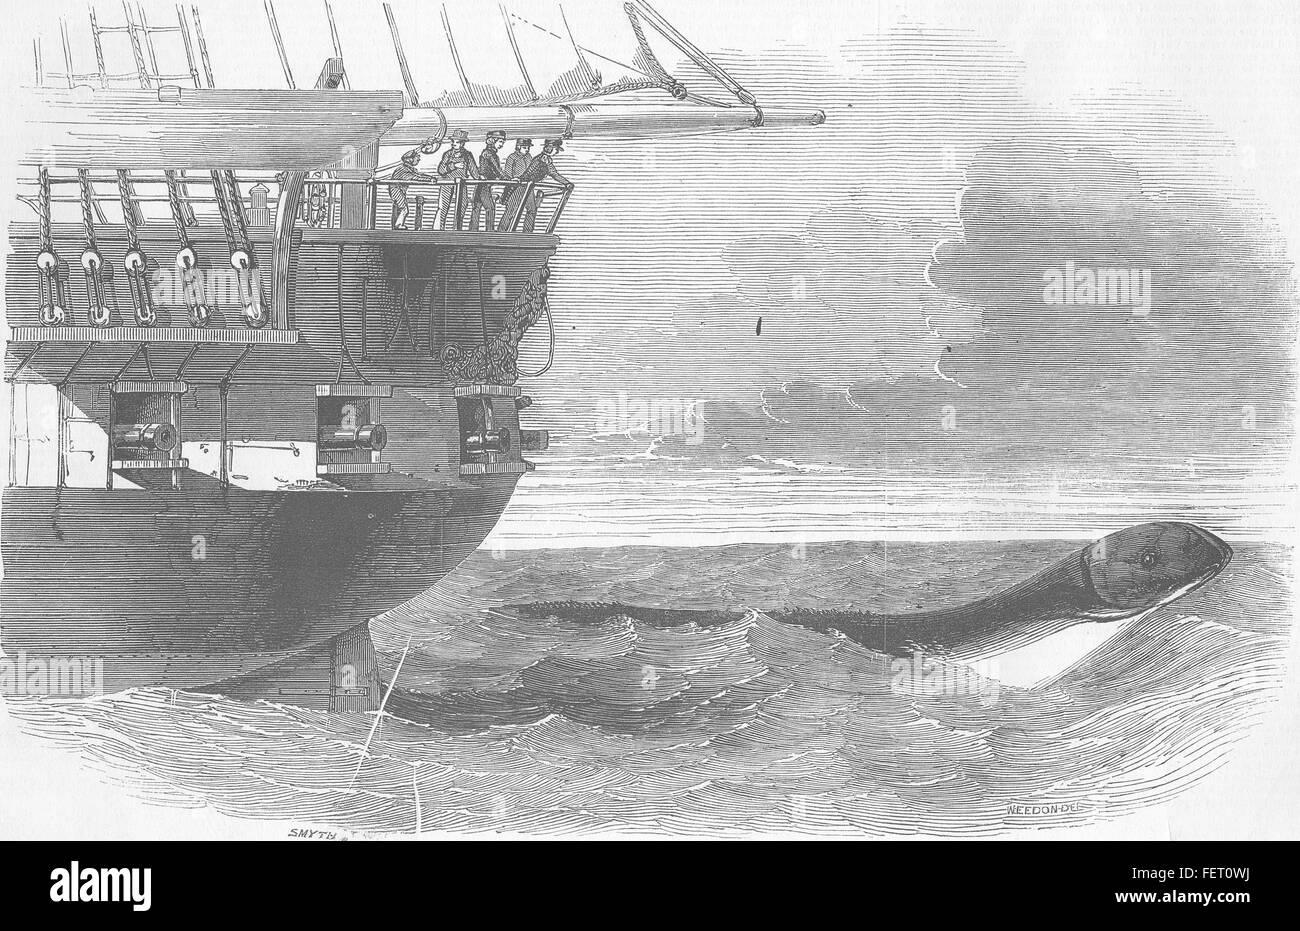 ANIMALS Sea-Serpent passing below Daedalus 1848. Illustrated London News - Stock Image